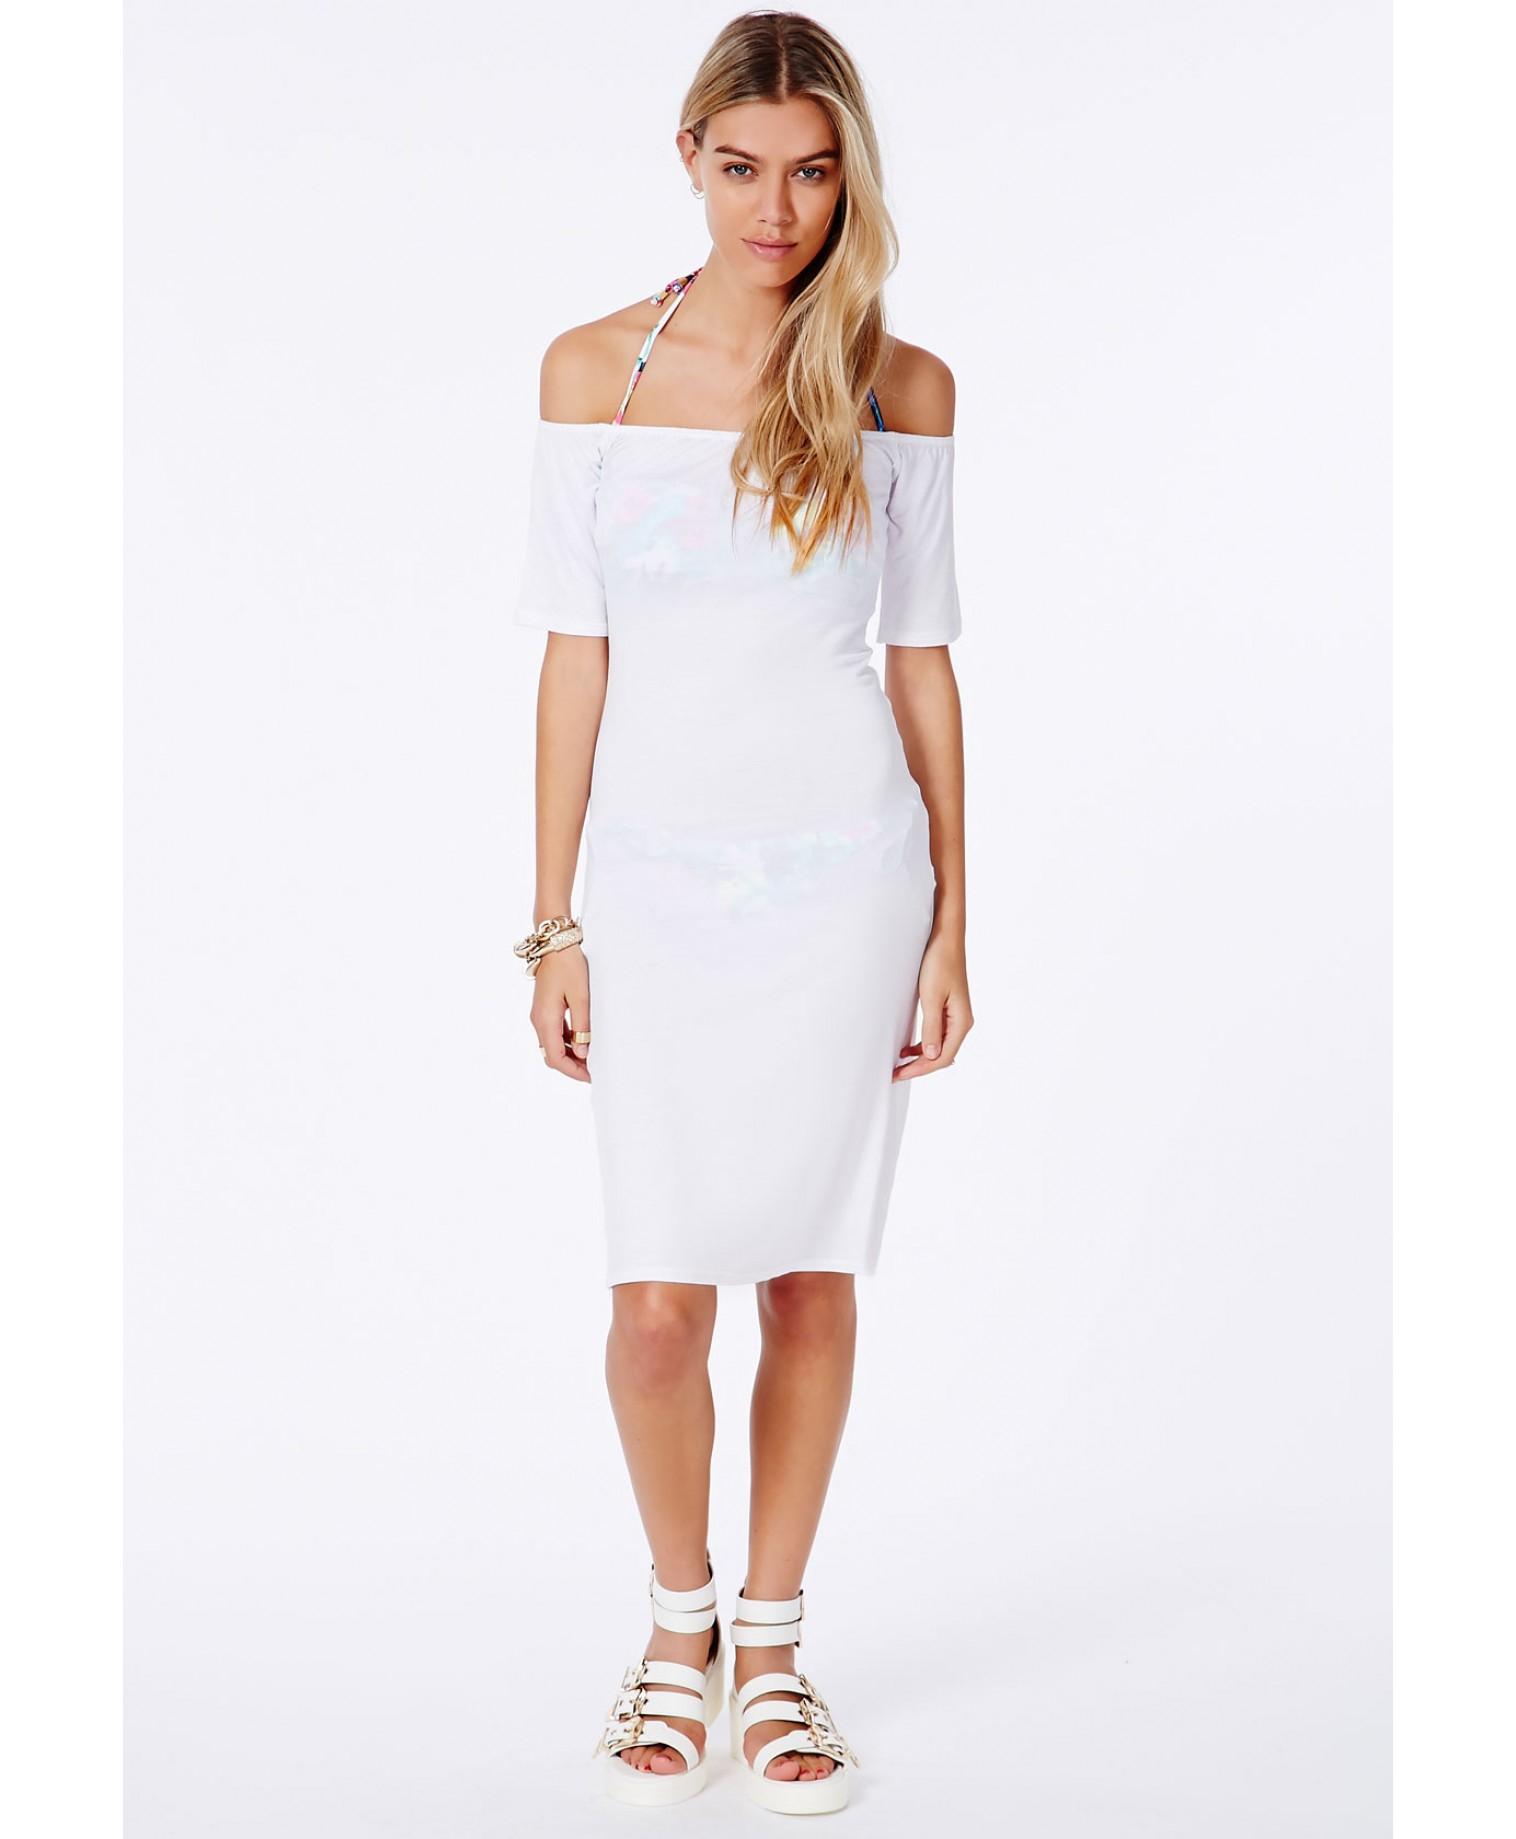 6230c11dfd10a Lyst - Missguided Dreya White Bardot Beach Cover-Up Midi Dress in White